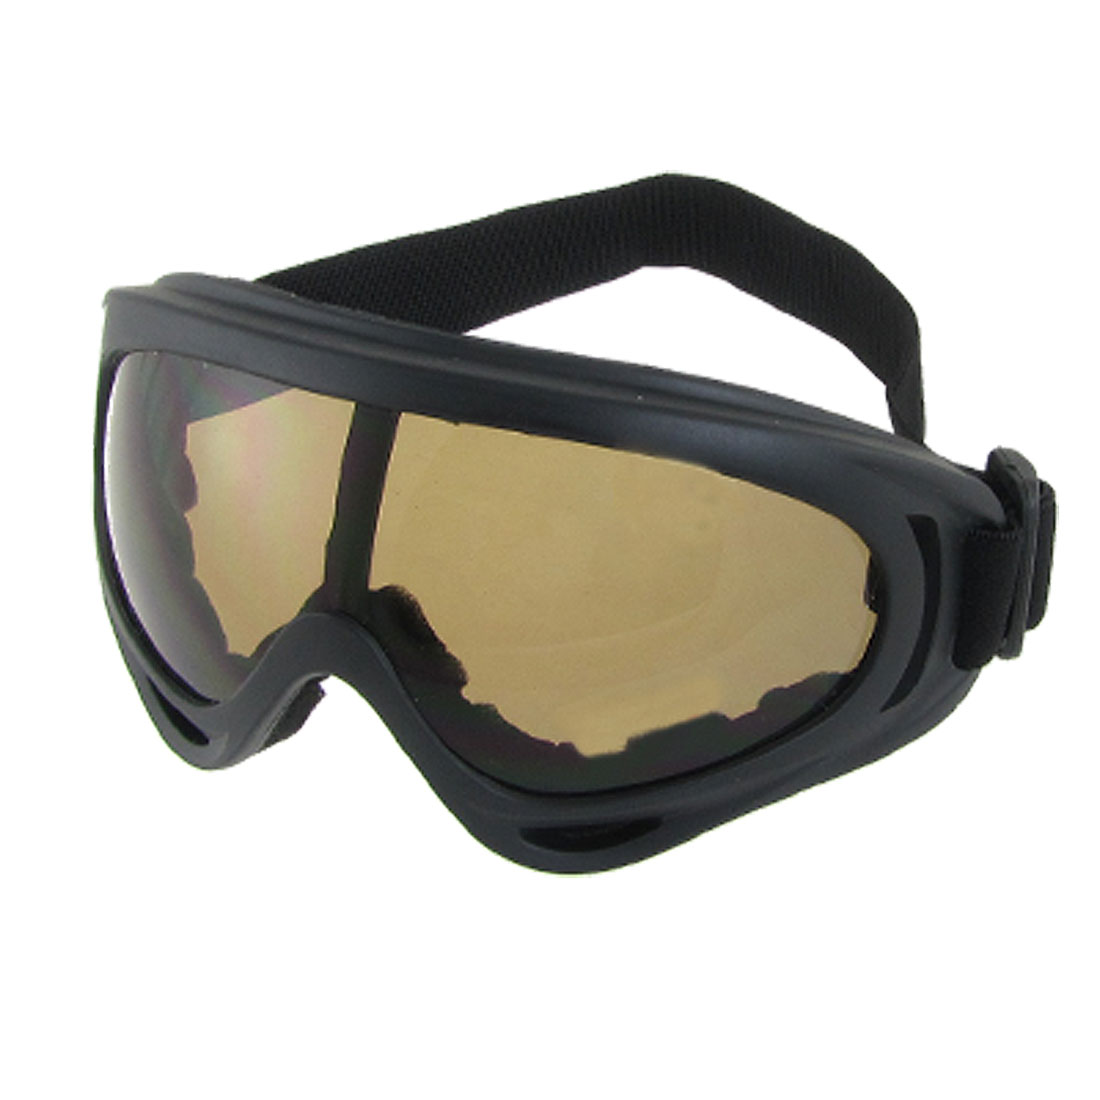 Adjustable Strap Full Frame Mirror Lens Ski Skate Eyewear Glasses Goggles Black by